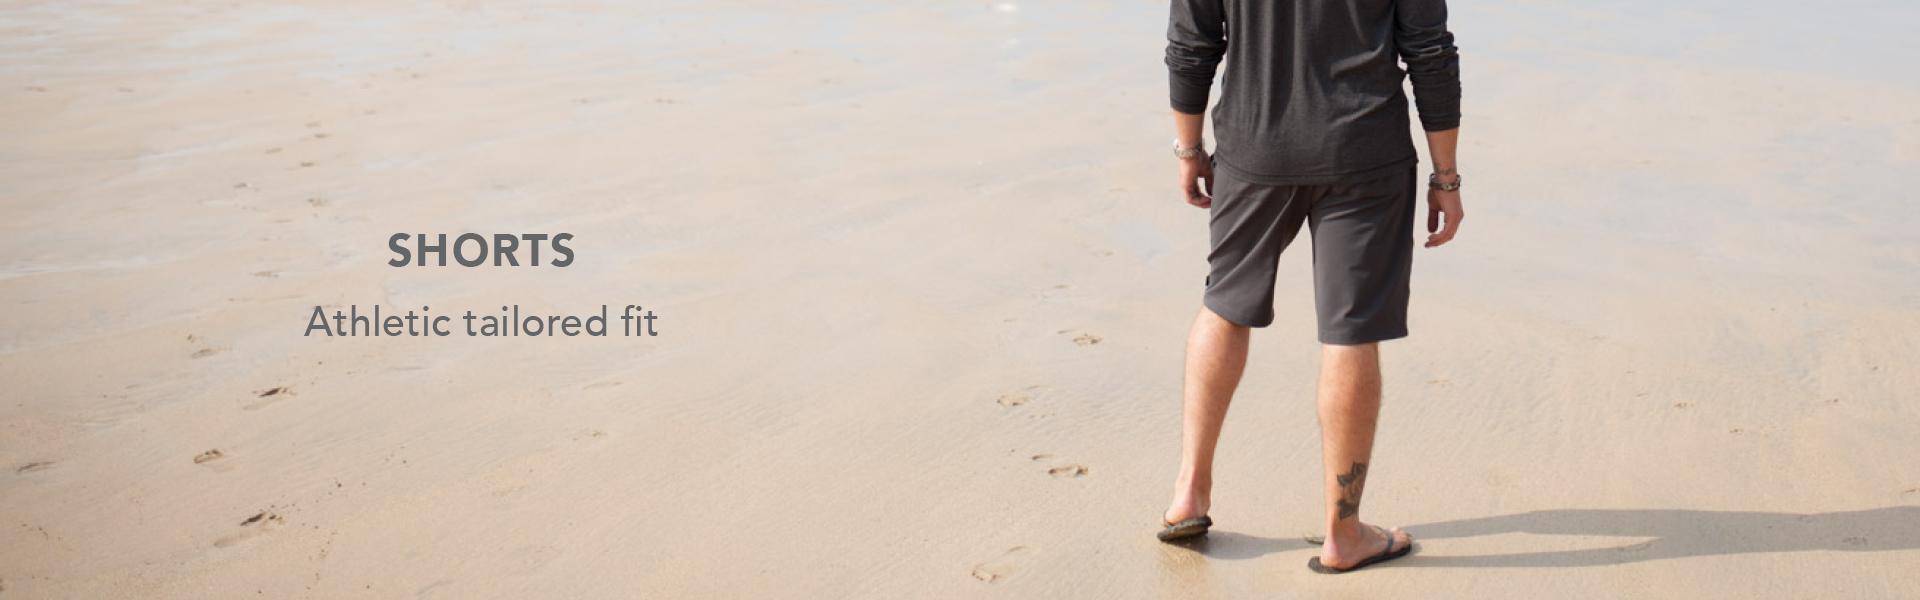 dunning-banner-anchor-sports-shorts-1.18.jpg